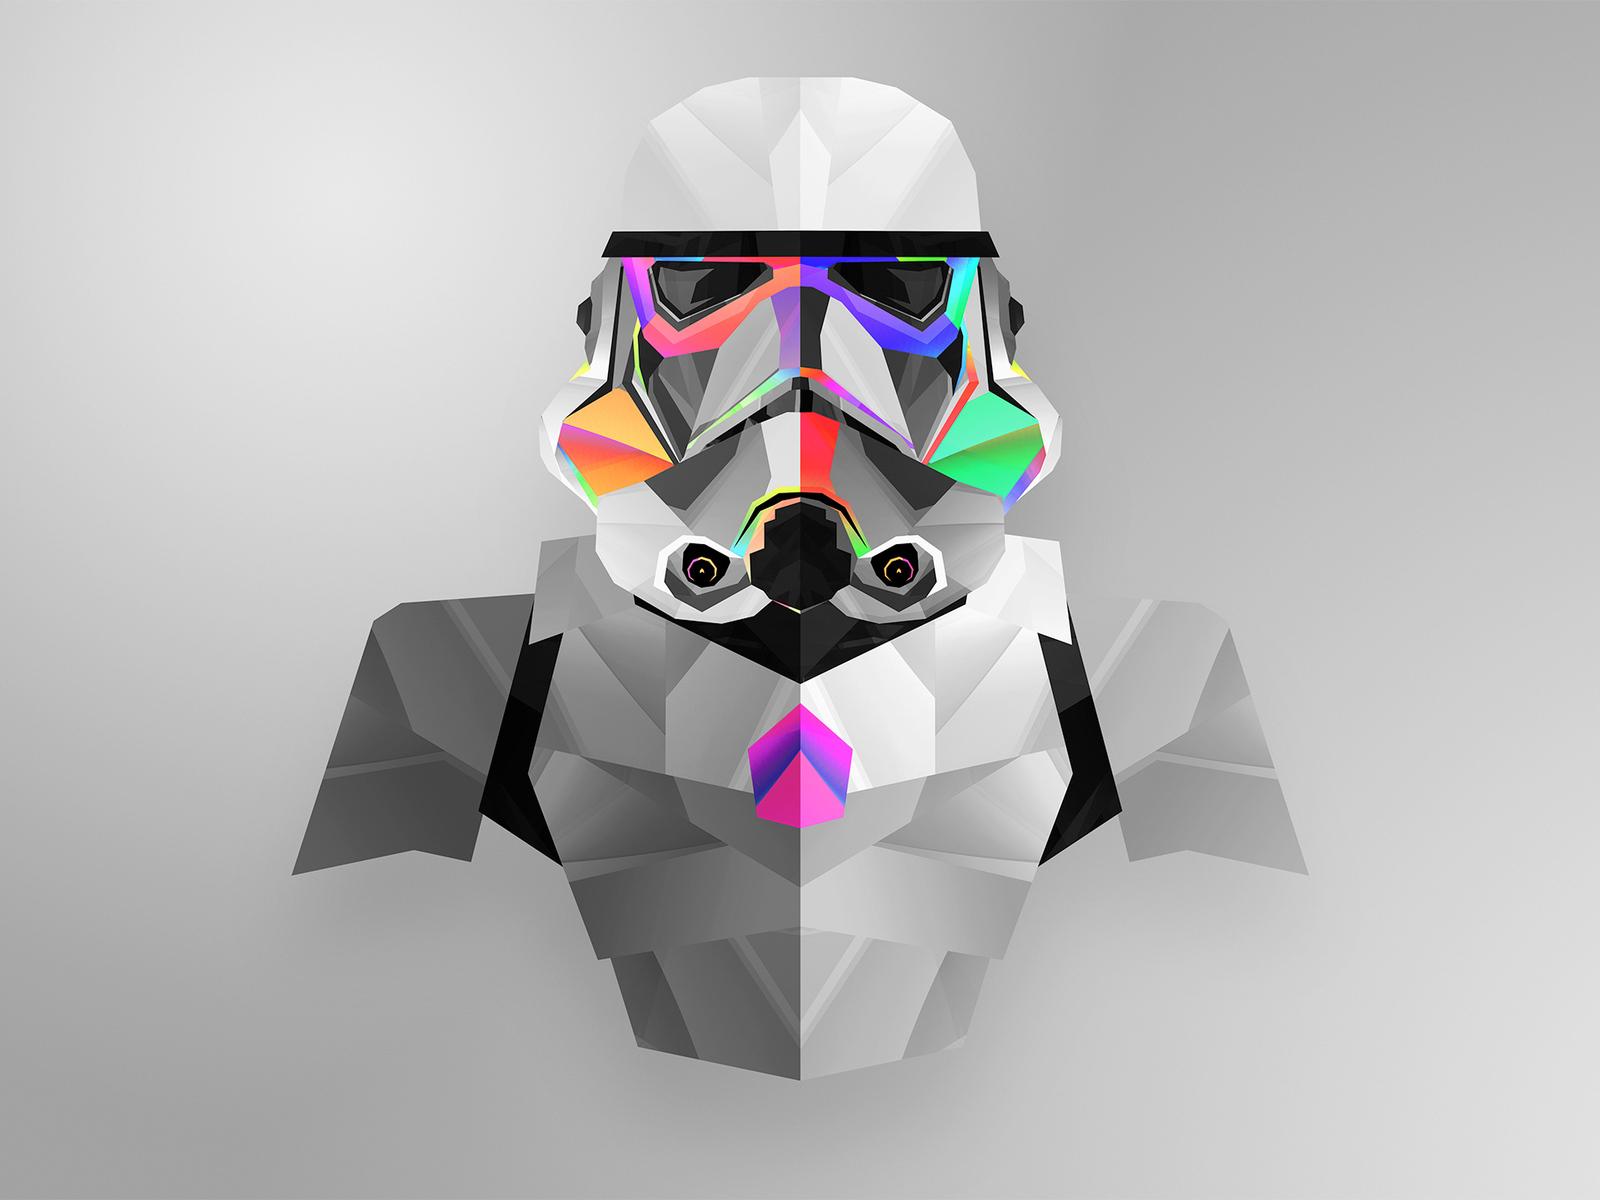 stormtrooper-abstract-art-r1.jpg